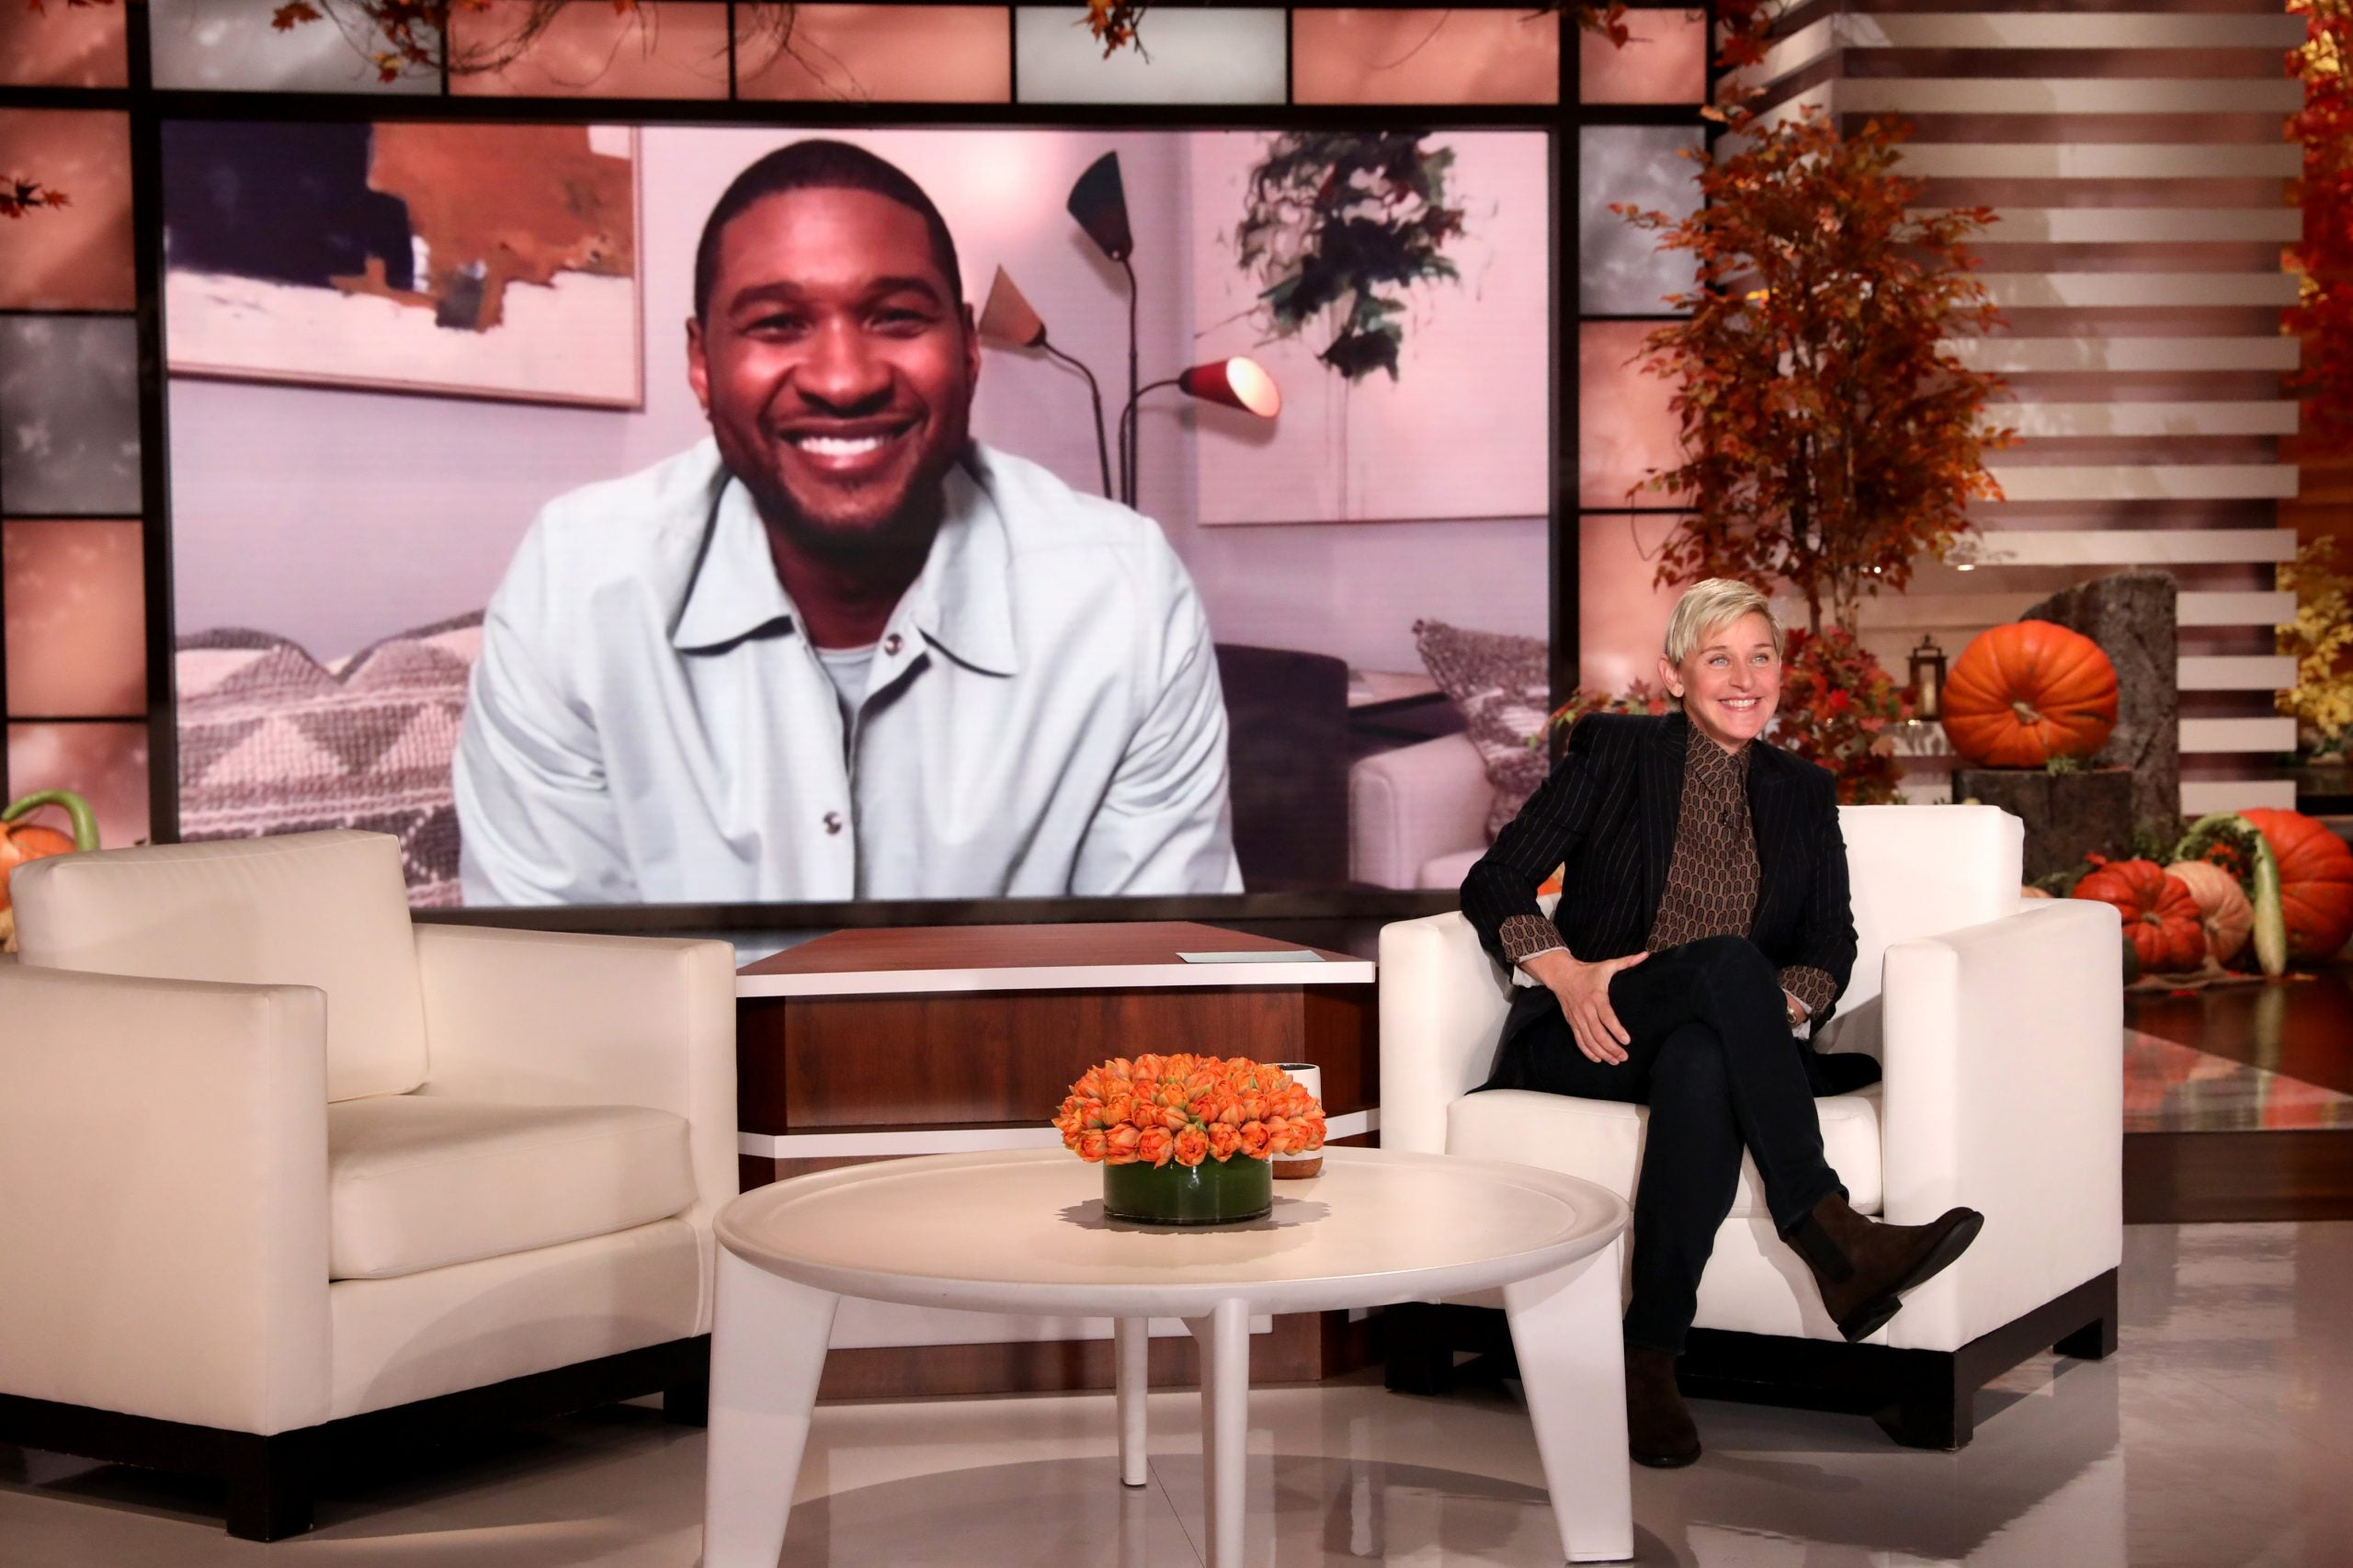 Usher Shares First Photos Of His Newborn Daughter on 'Ellen'